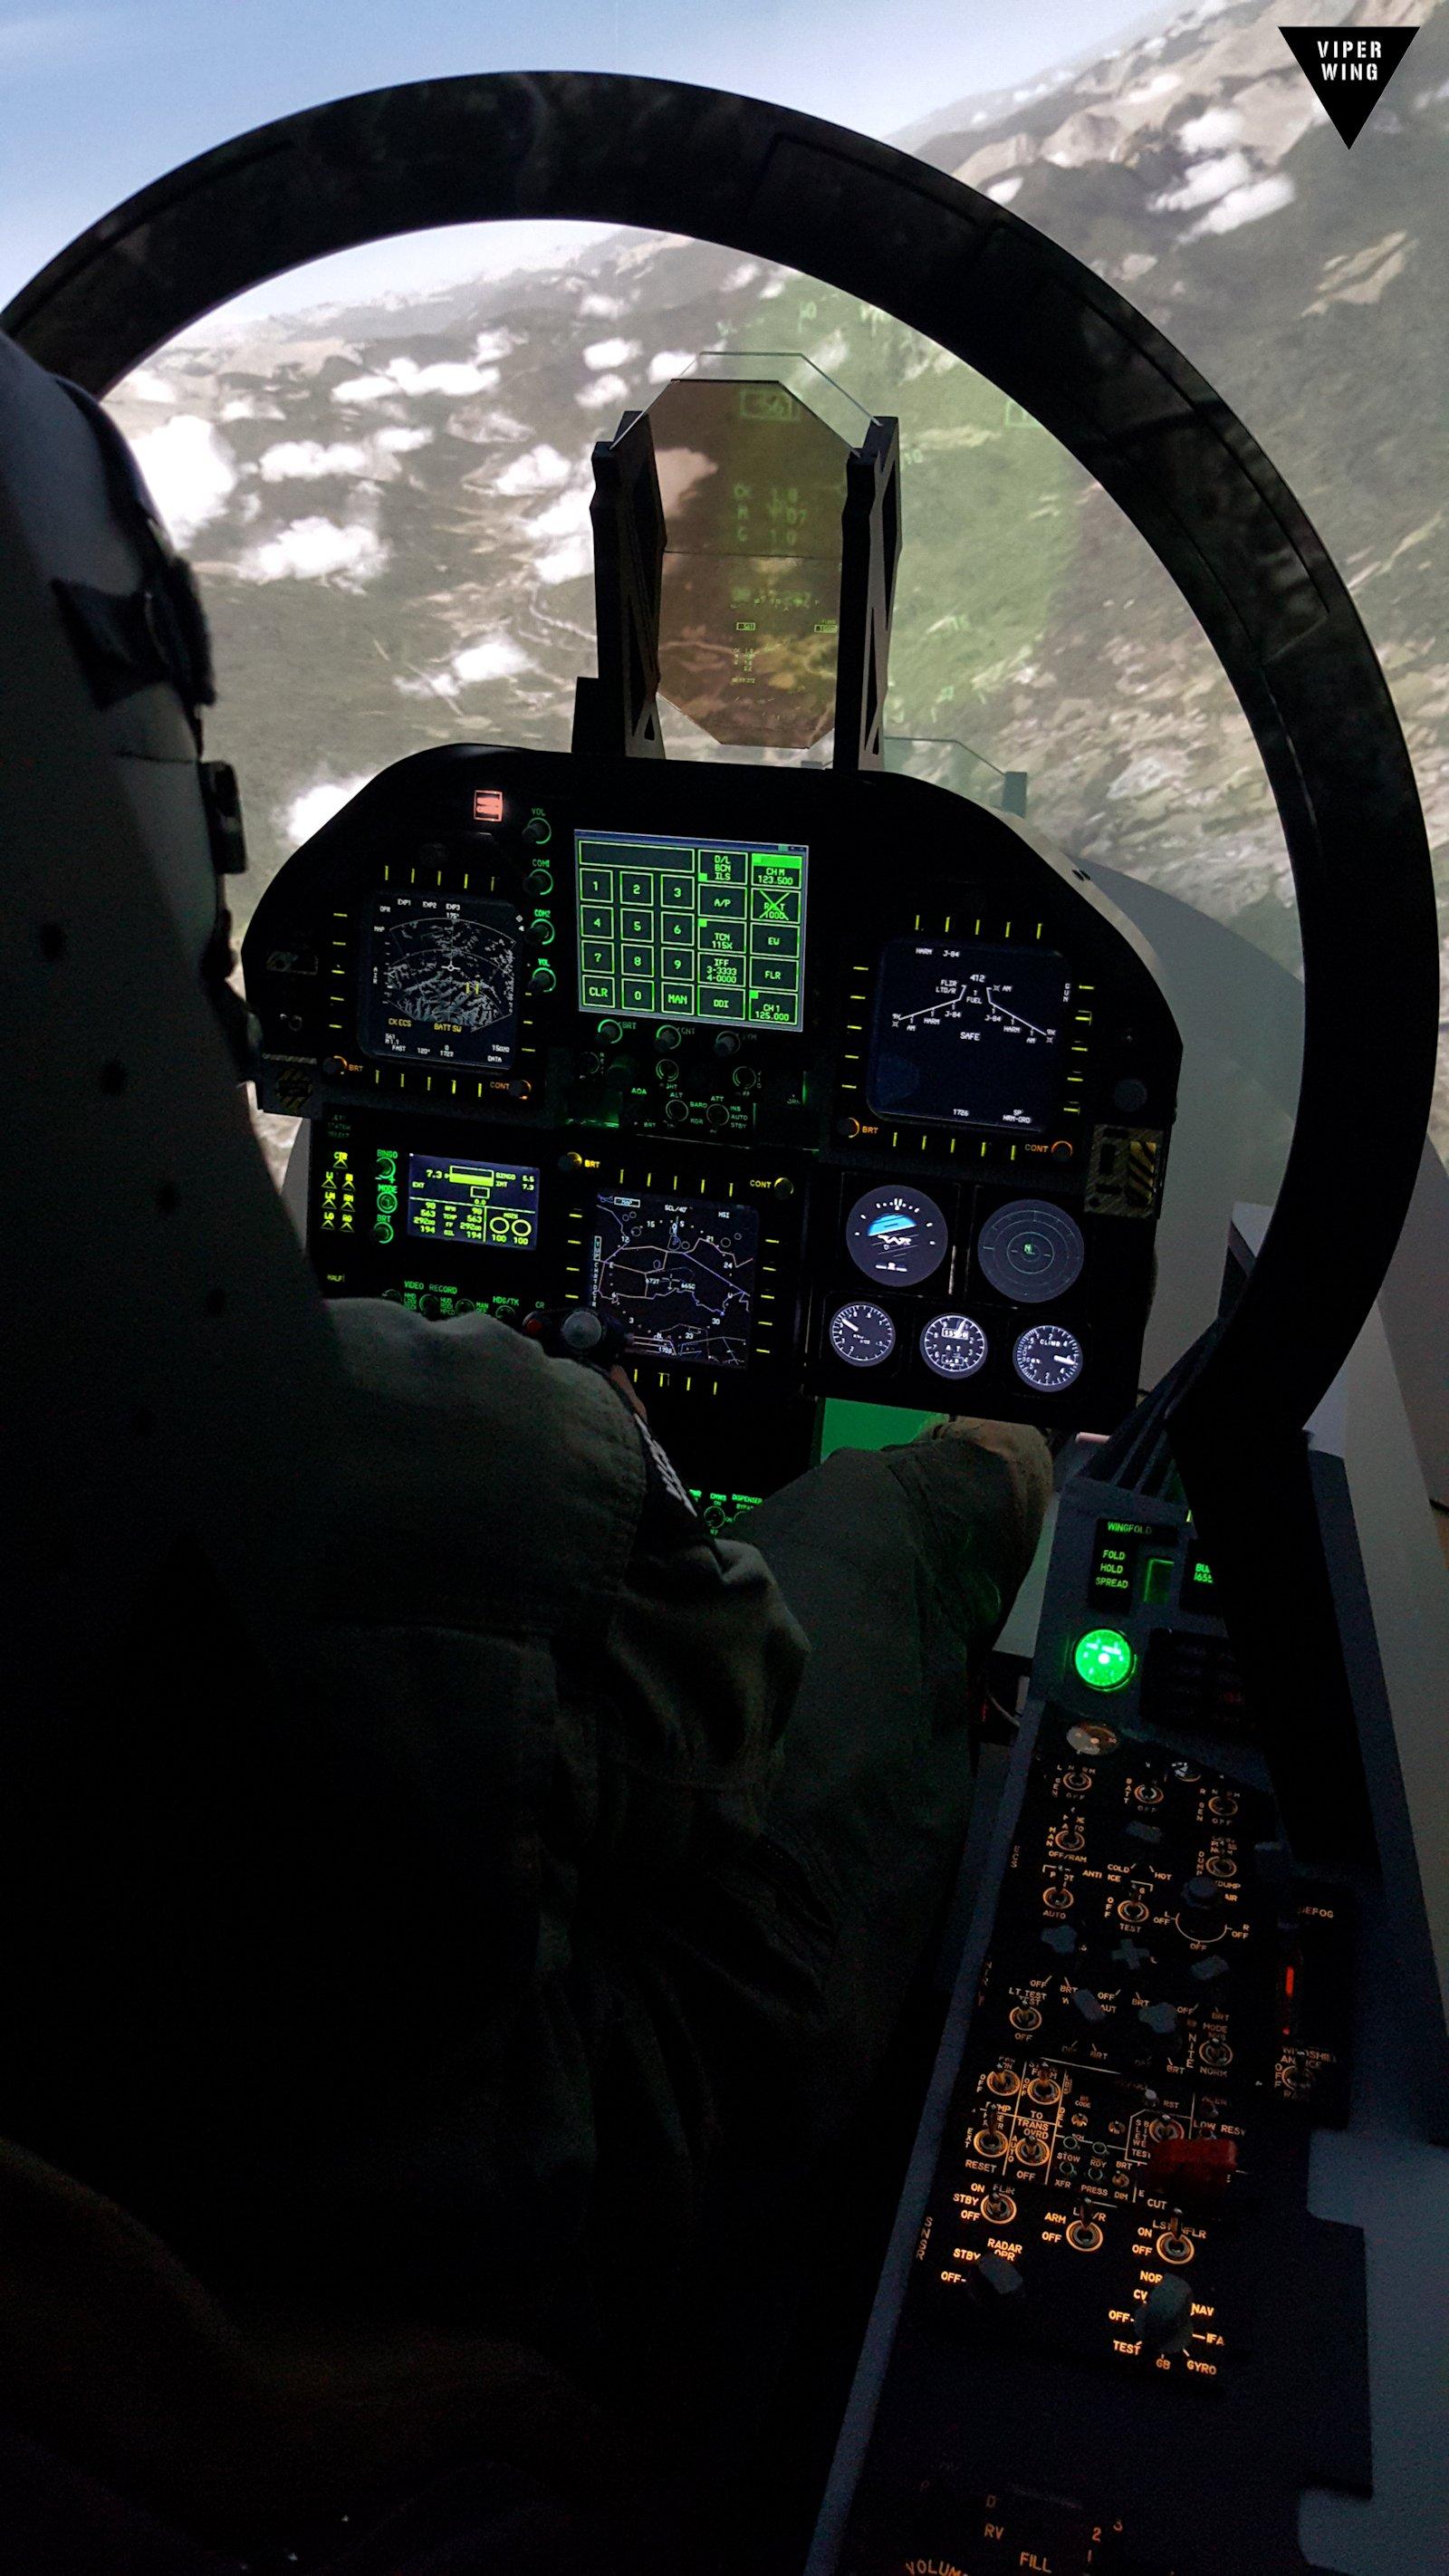 F-18, F/A-18 simulator fighter jet cockpit - all physical Hornet sim